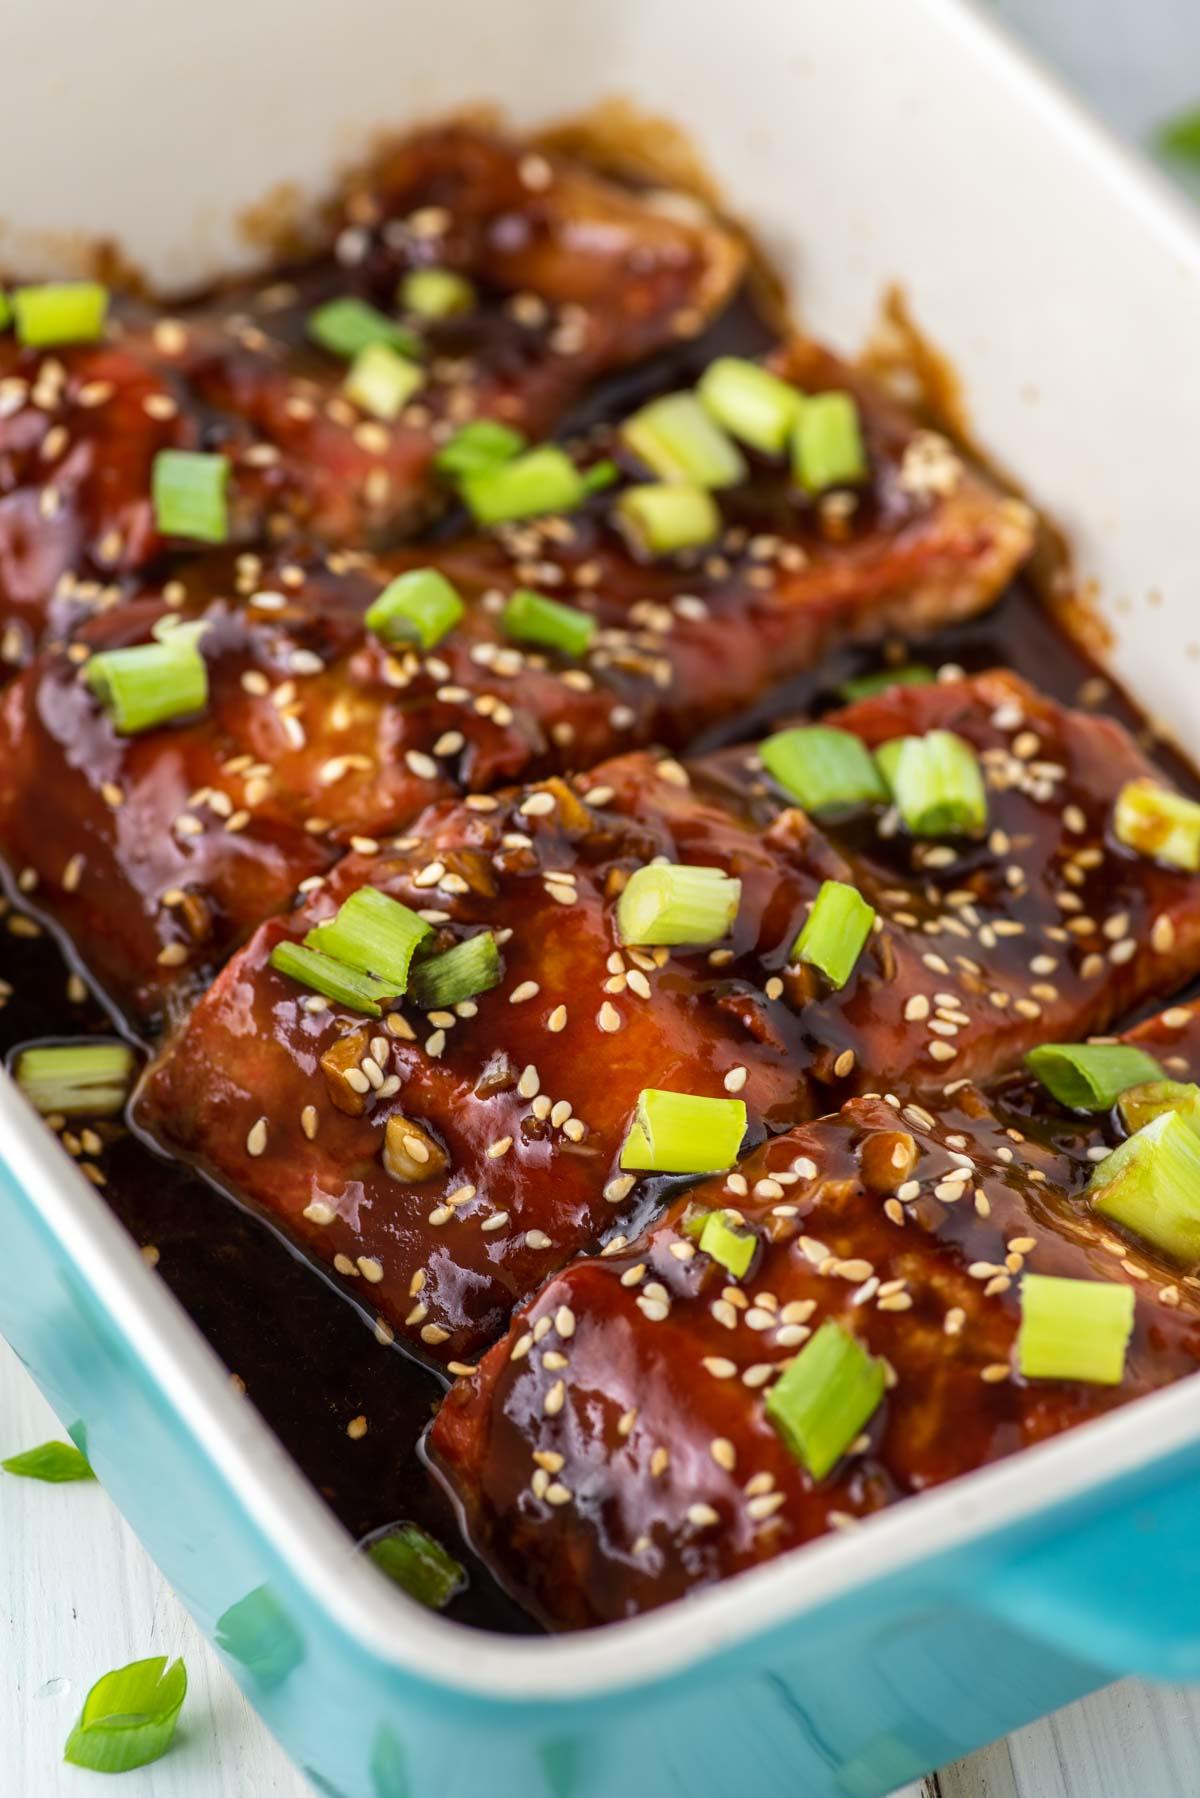 teriyaki salmon in baking dish